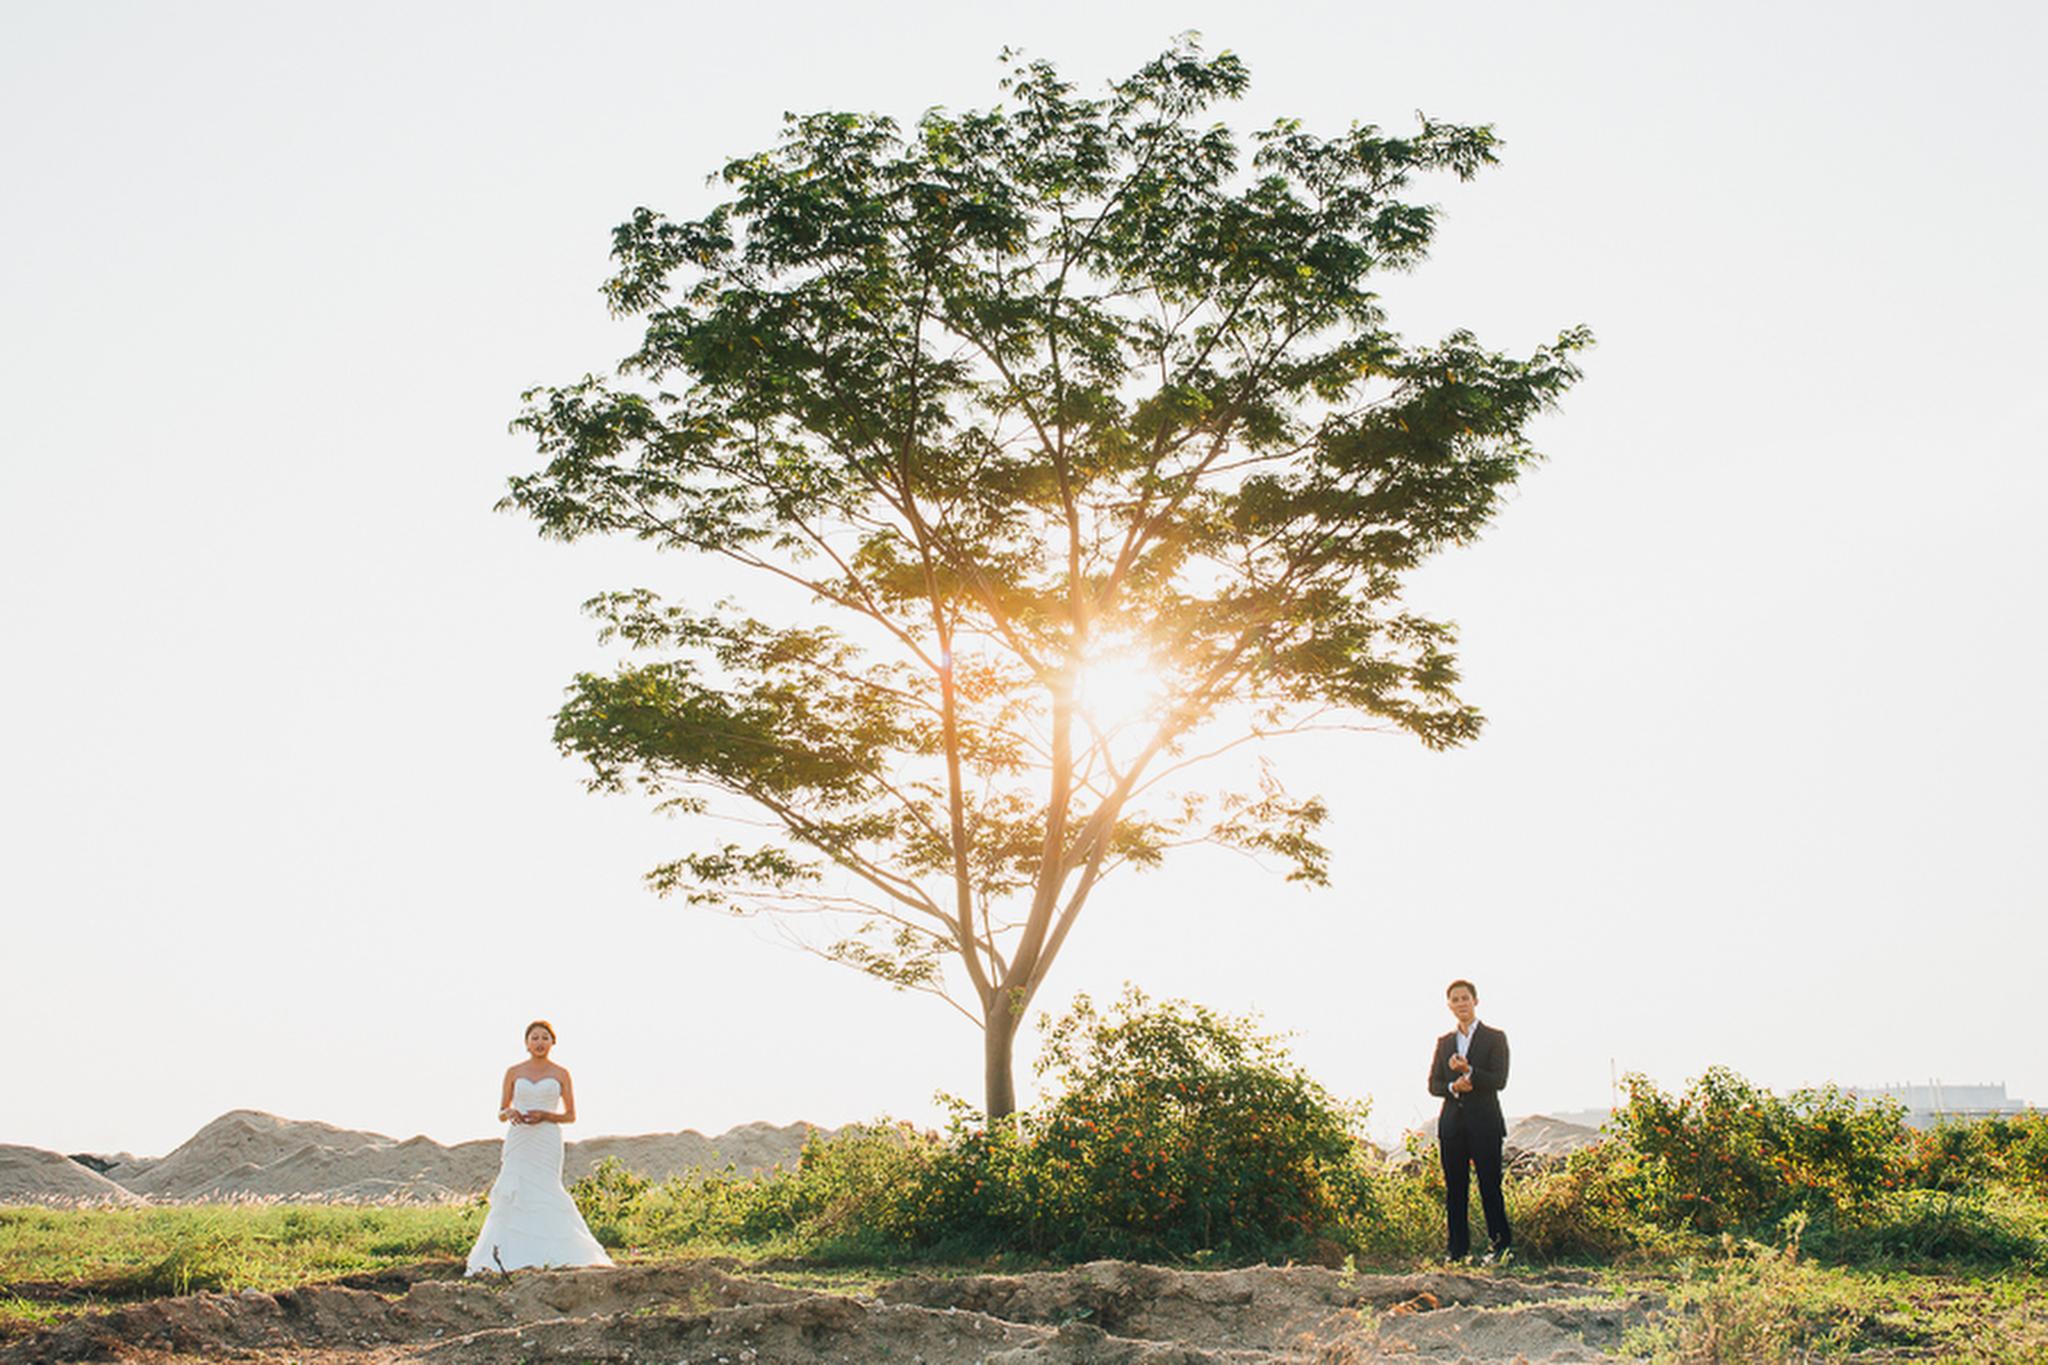 Singapore Wedding Photographer - Weisheng & Justina (44 of 47).JPG